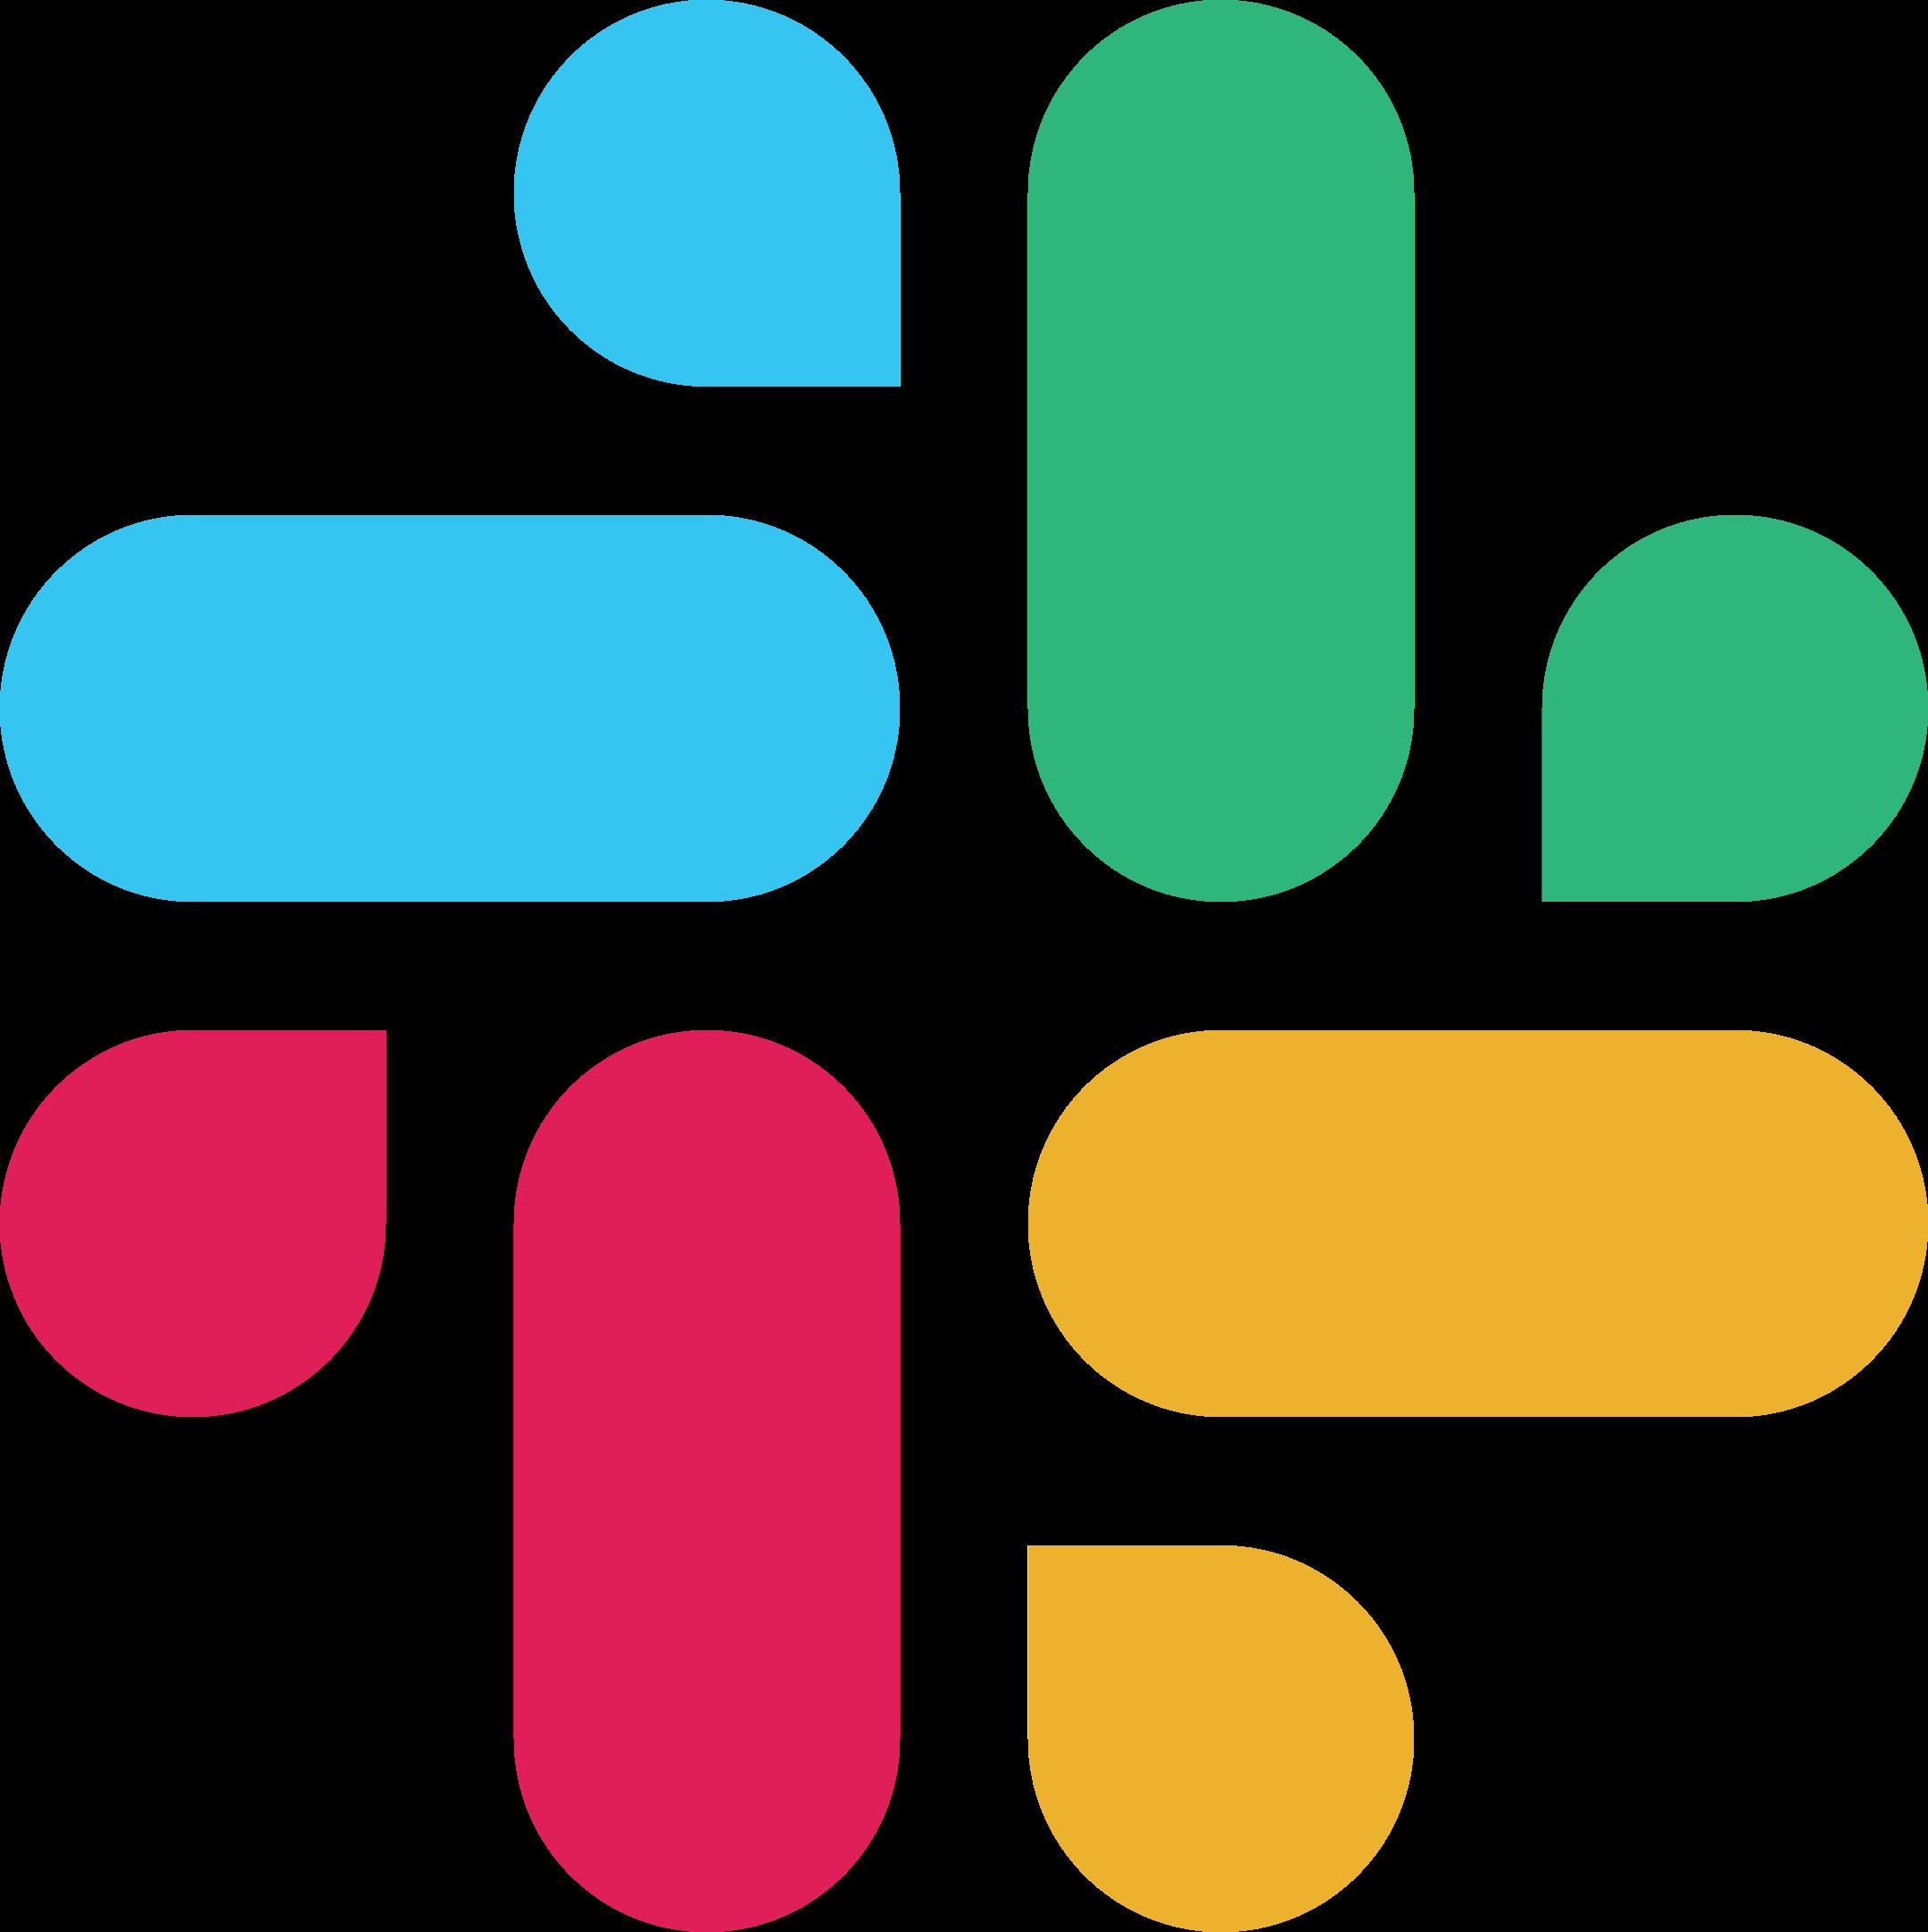 slack logo 3 - Slack Logo